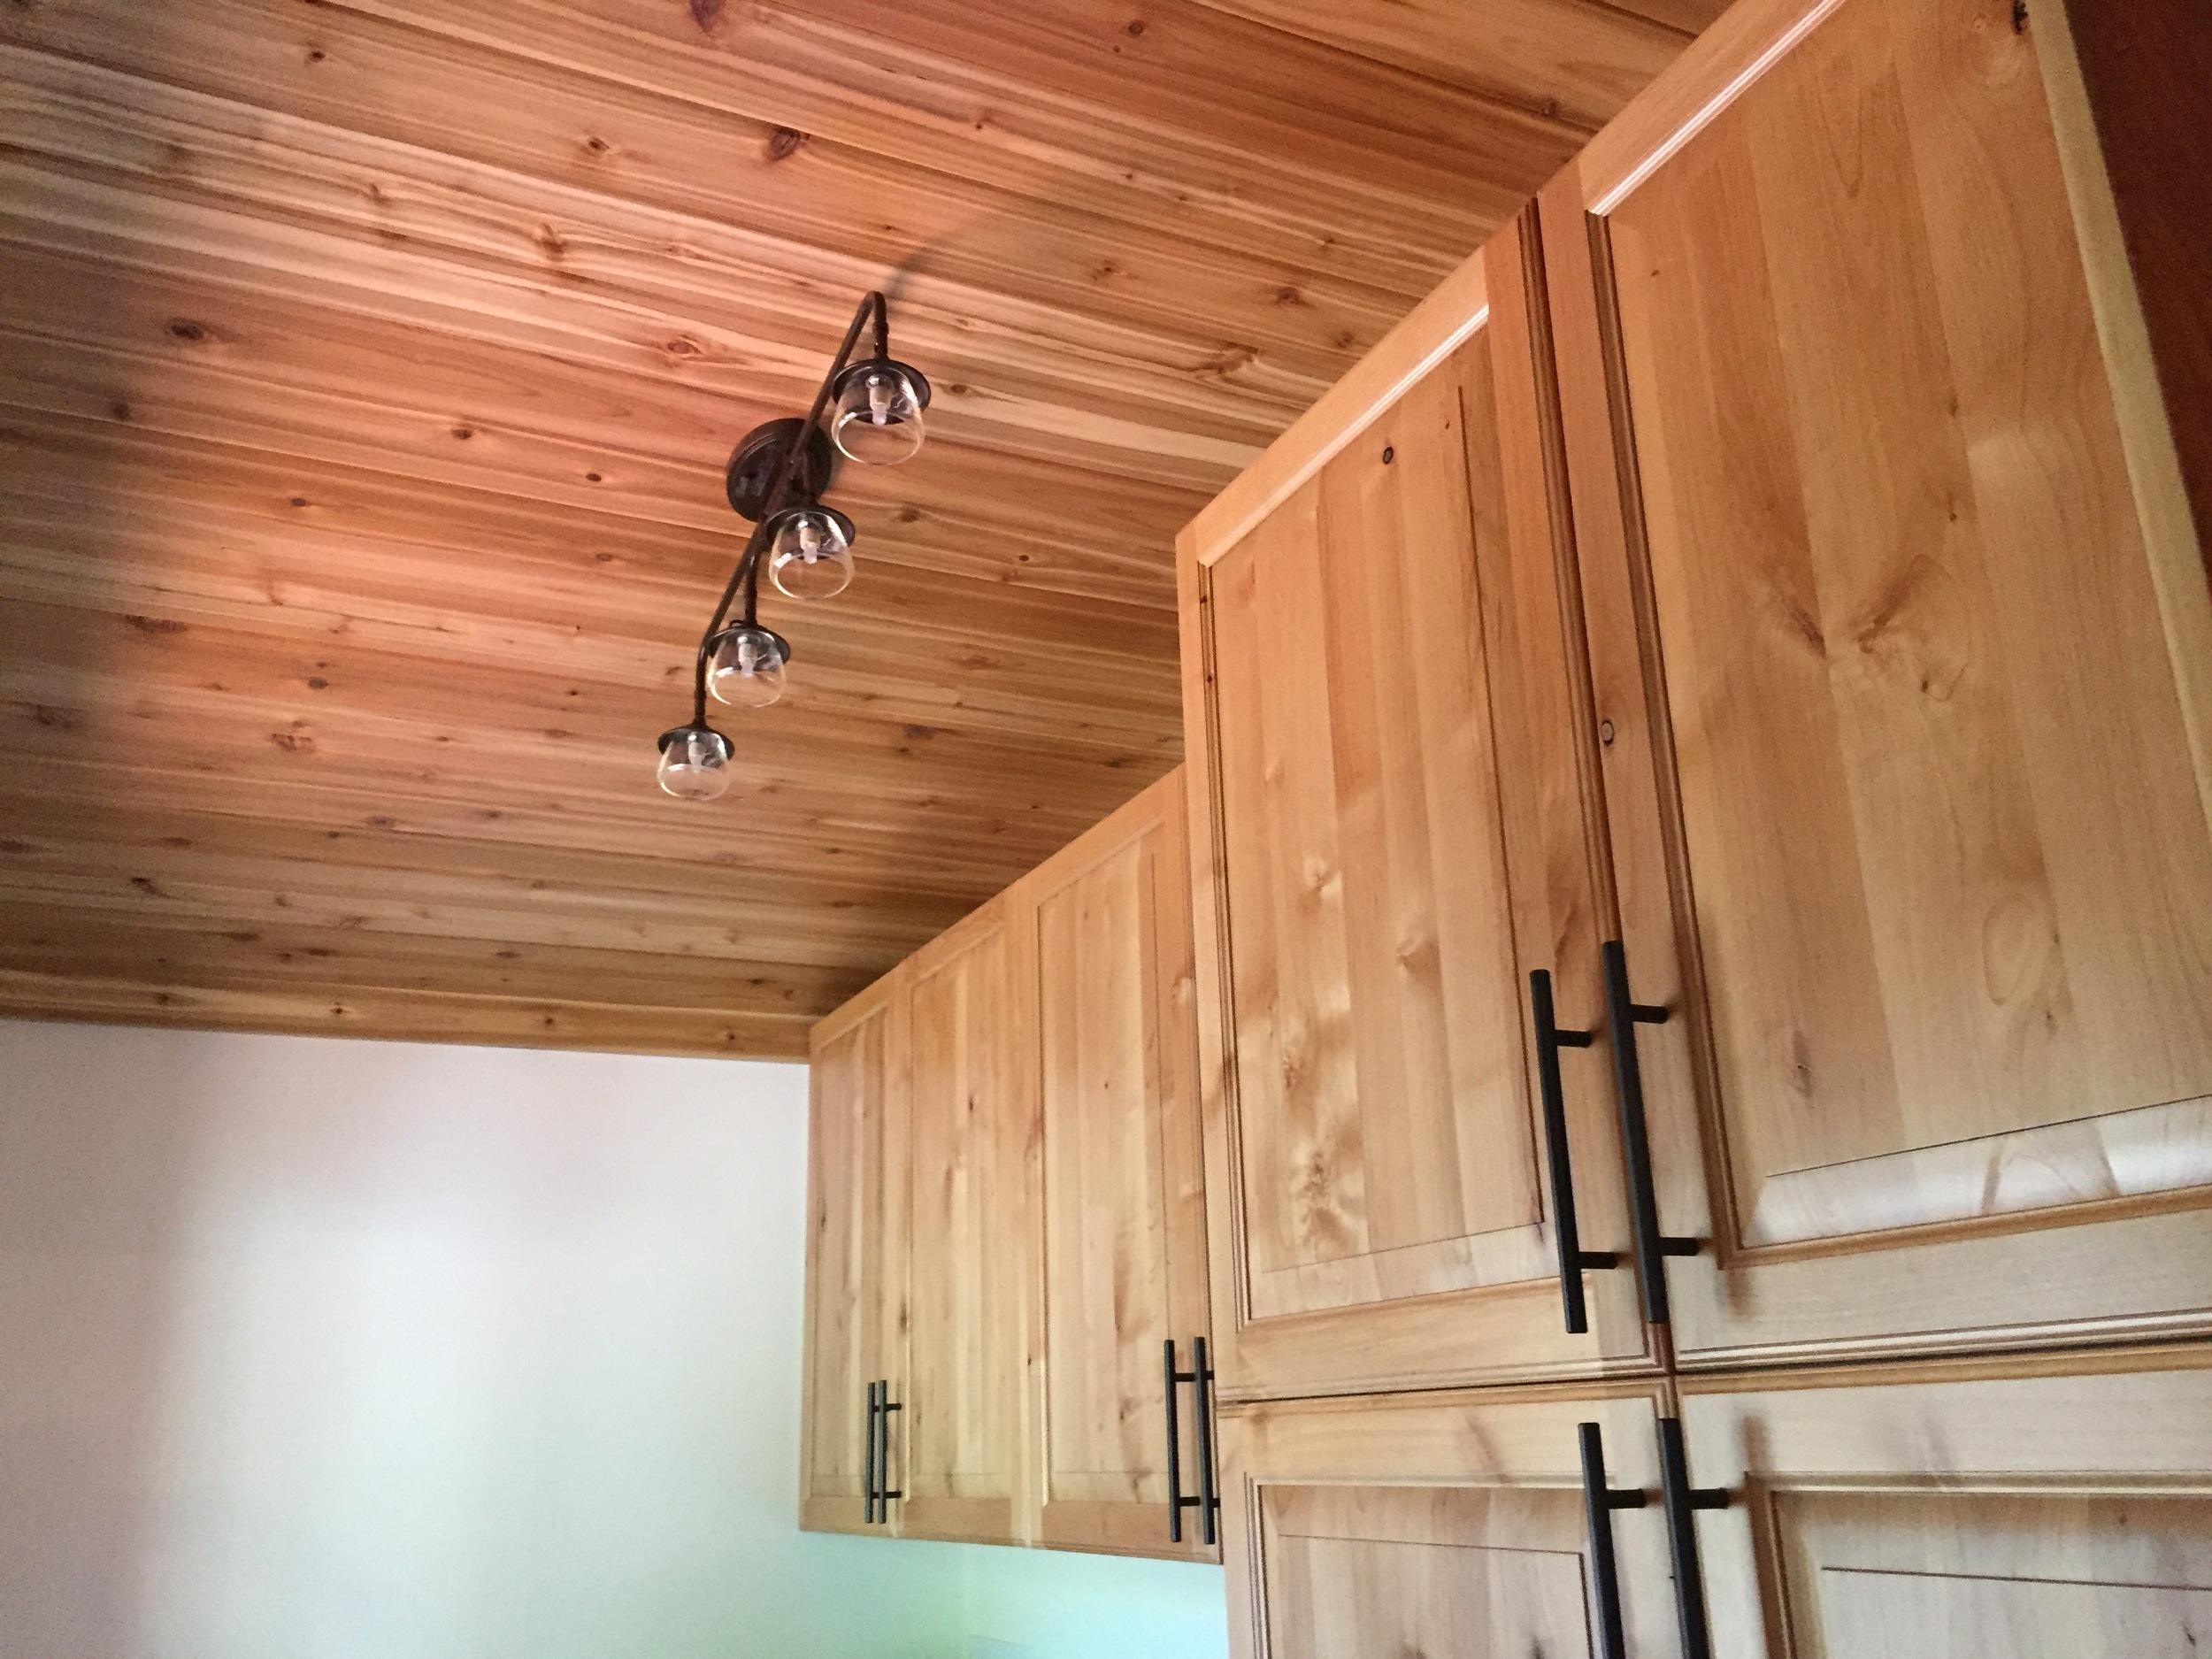 Cedar ceiling, vintage inspired lighting, hickory cabinets.